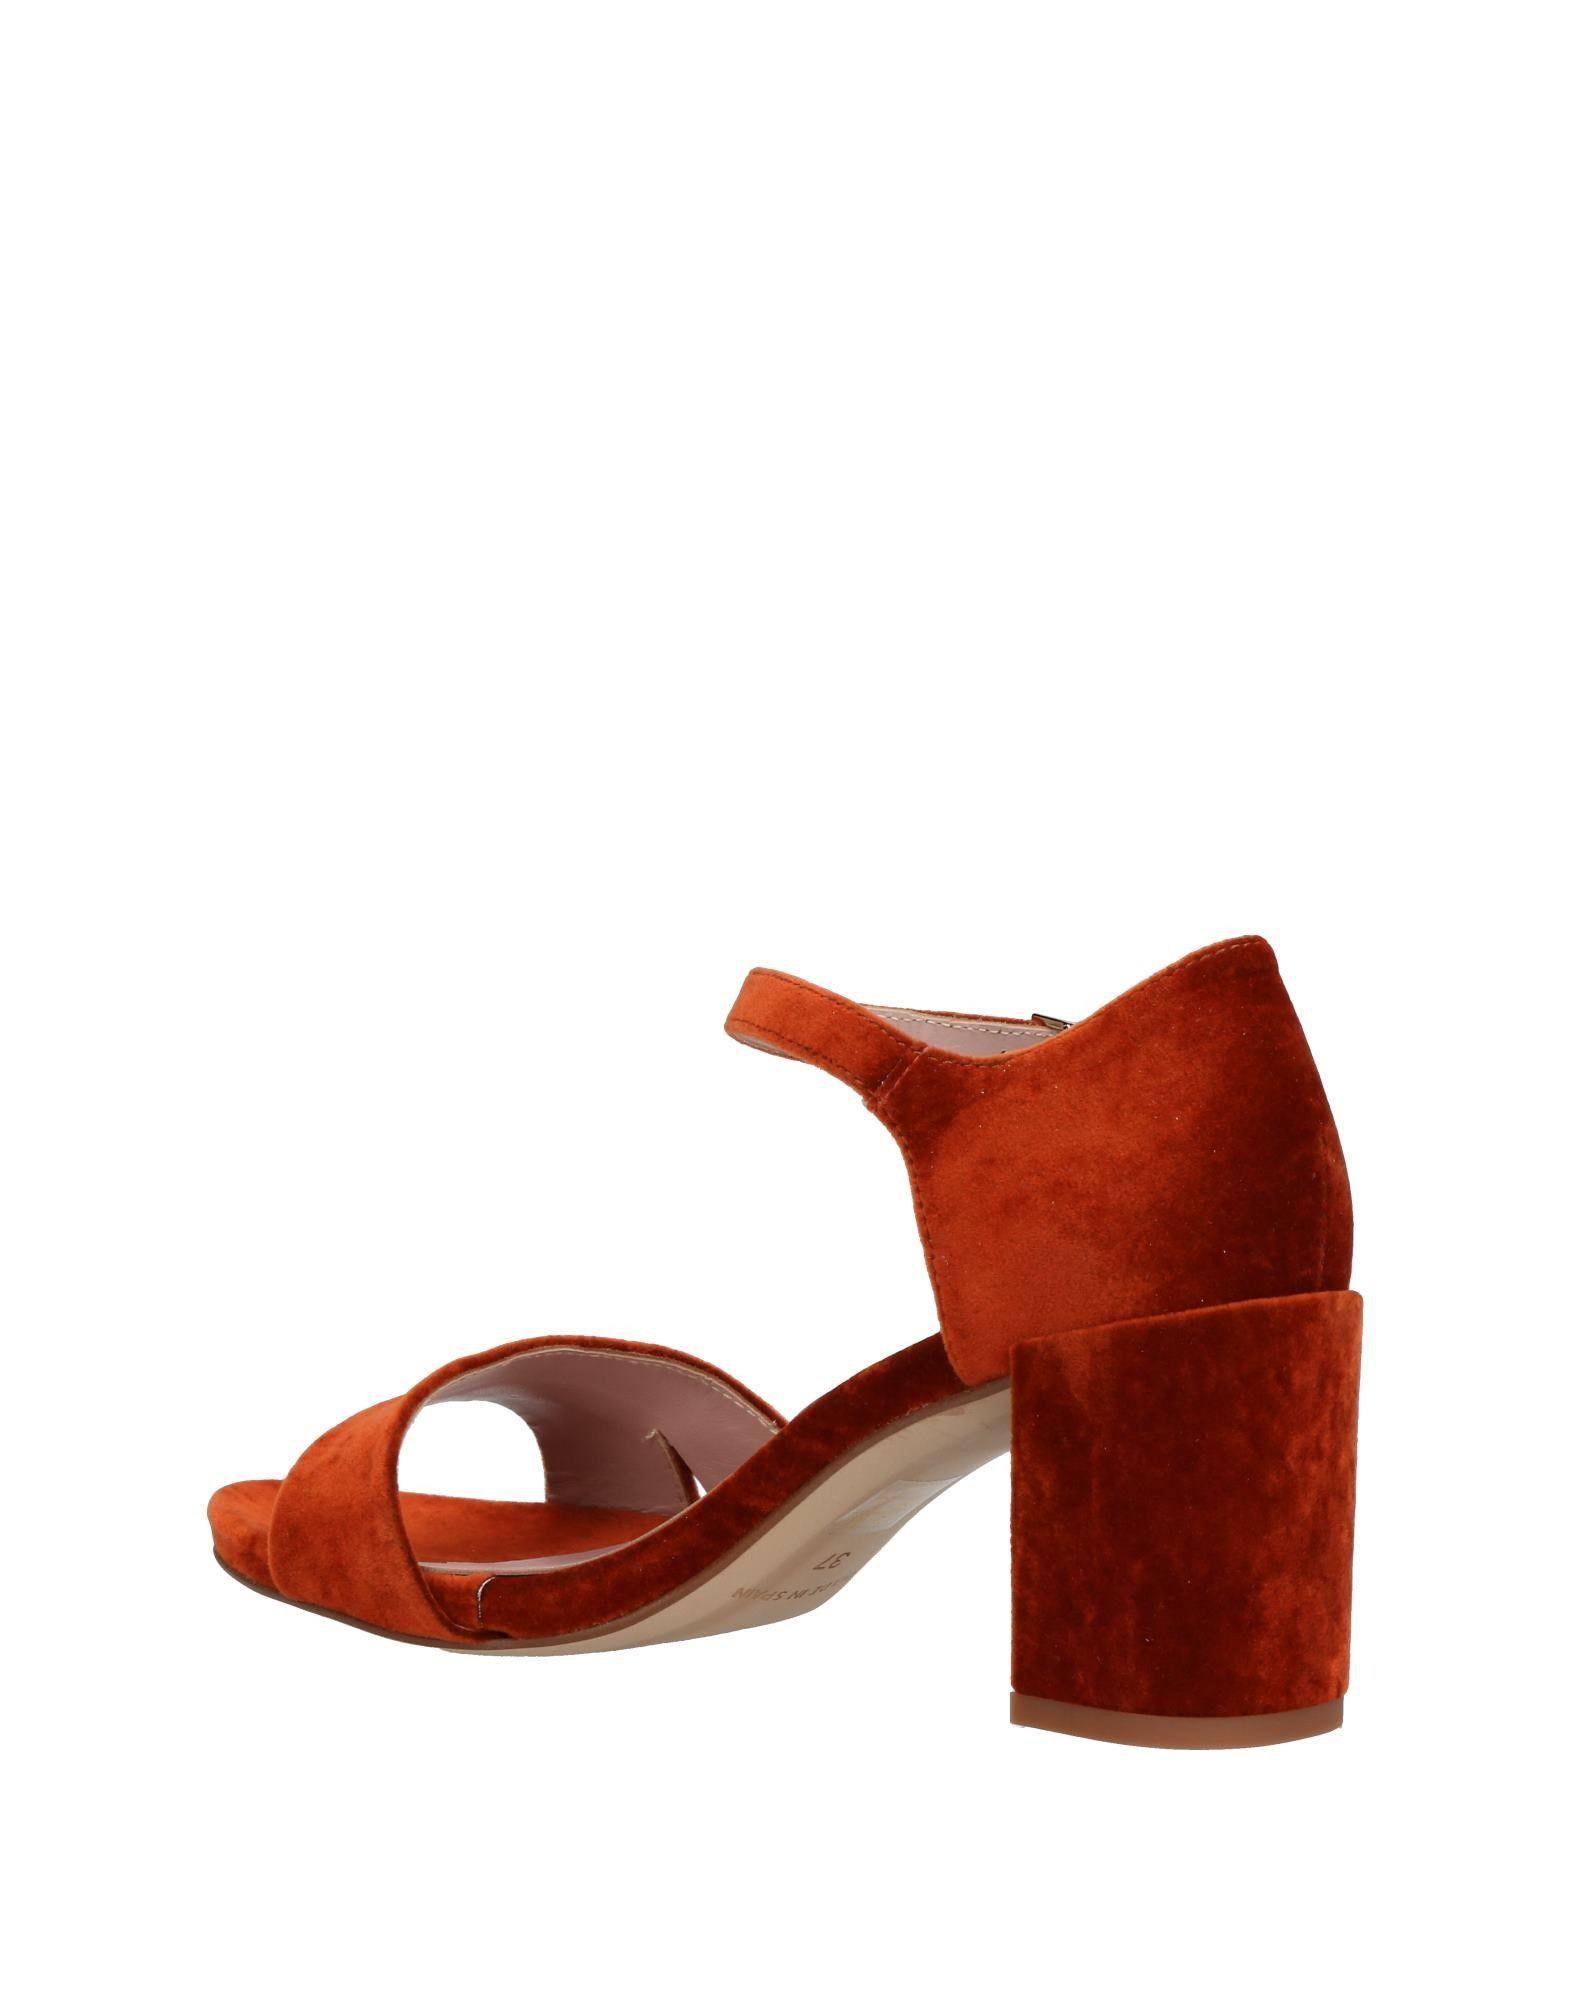 Ancarani Rust Velvet Heeled Sandals